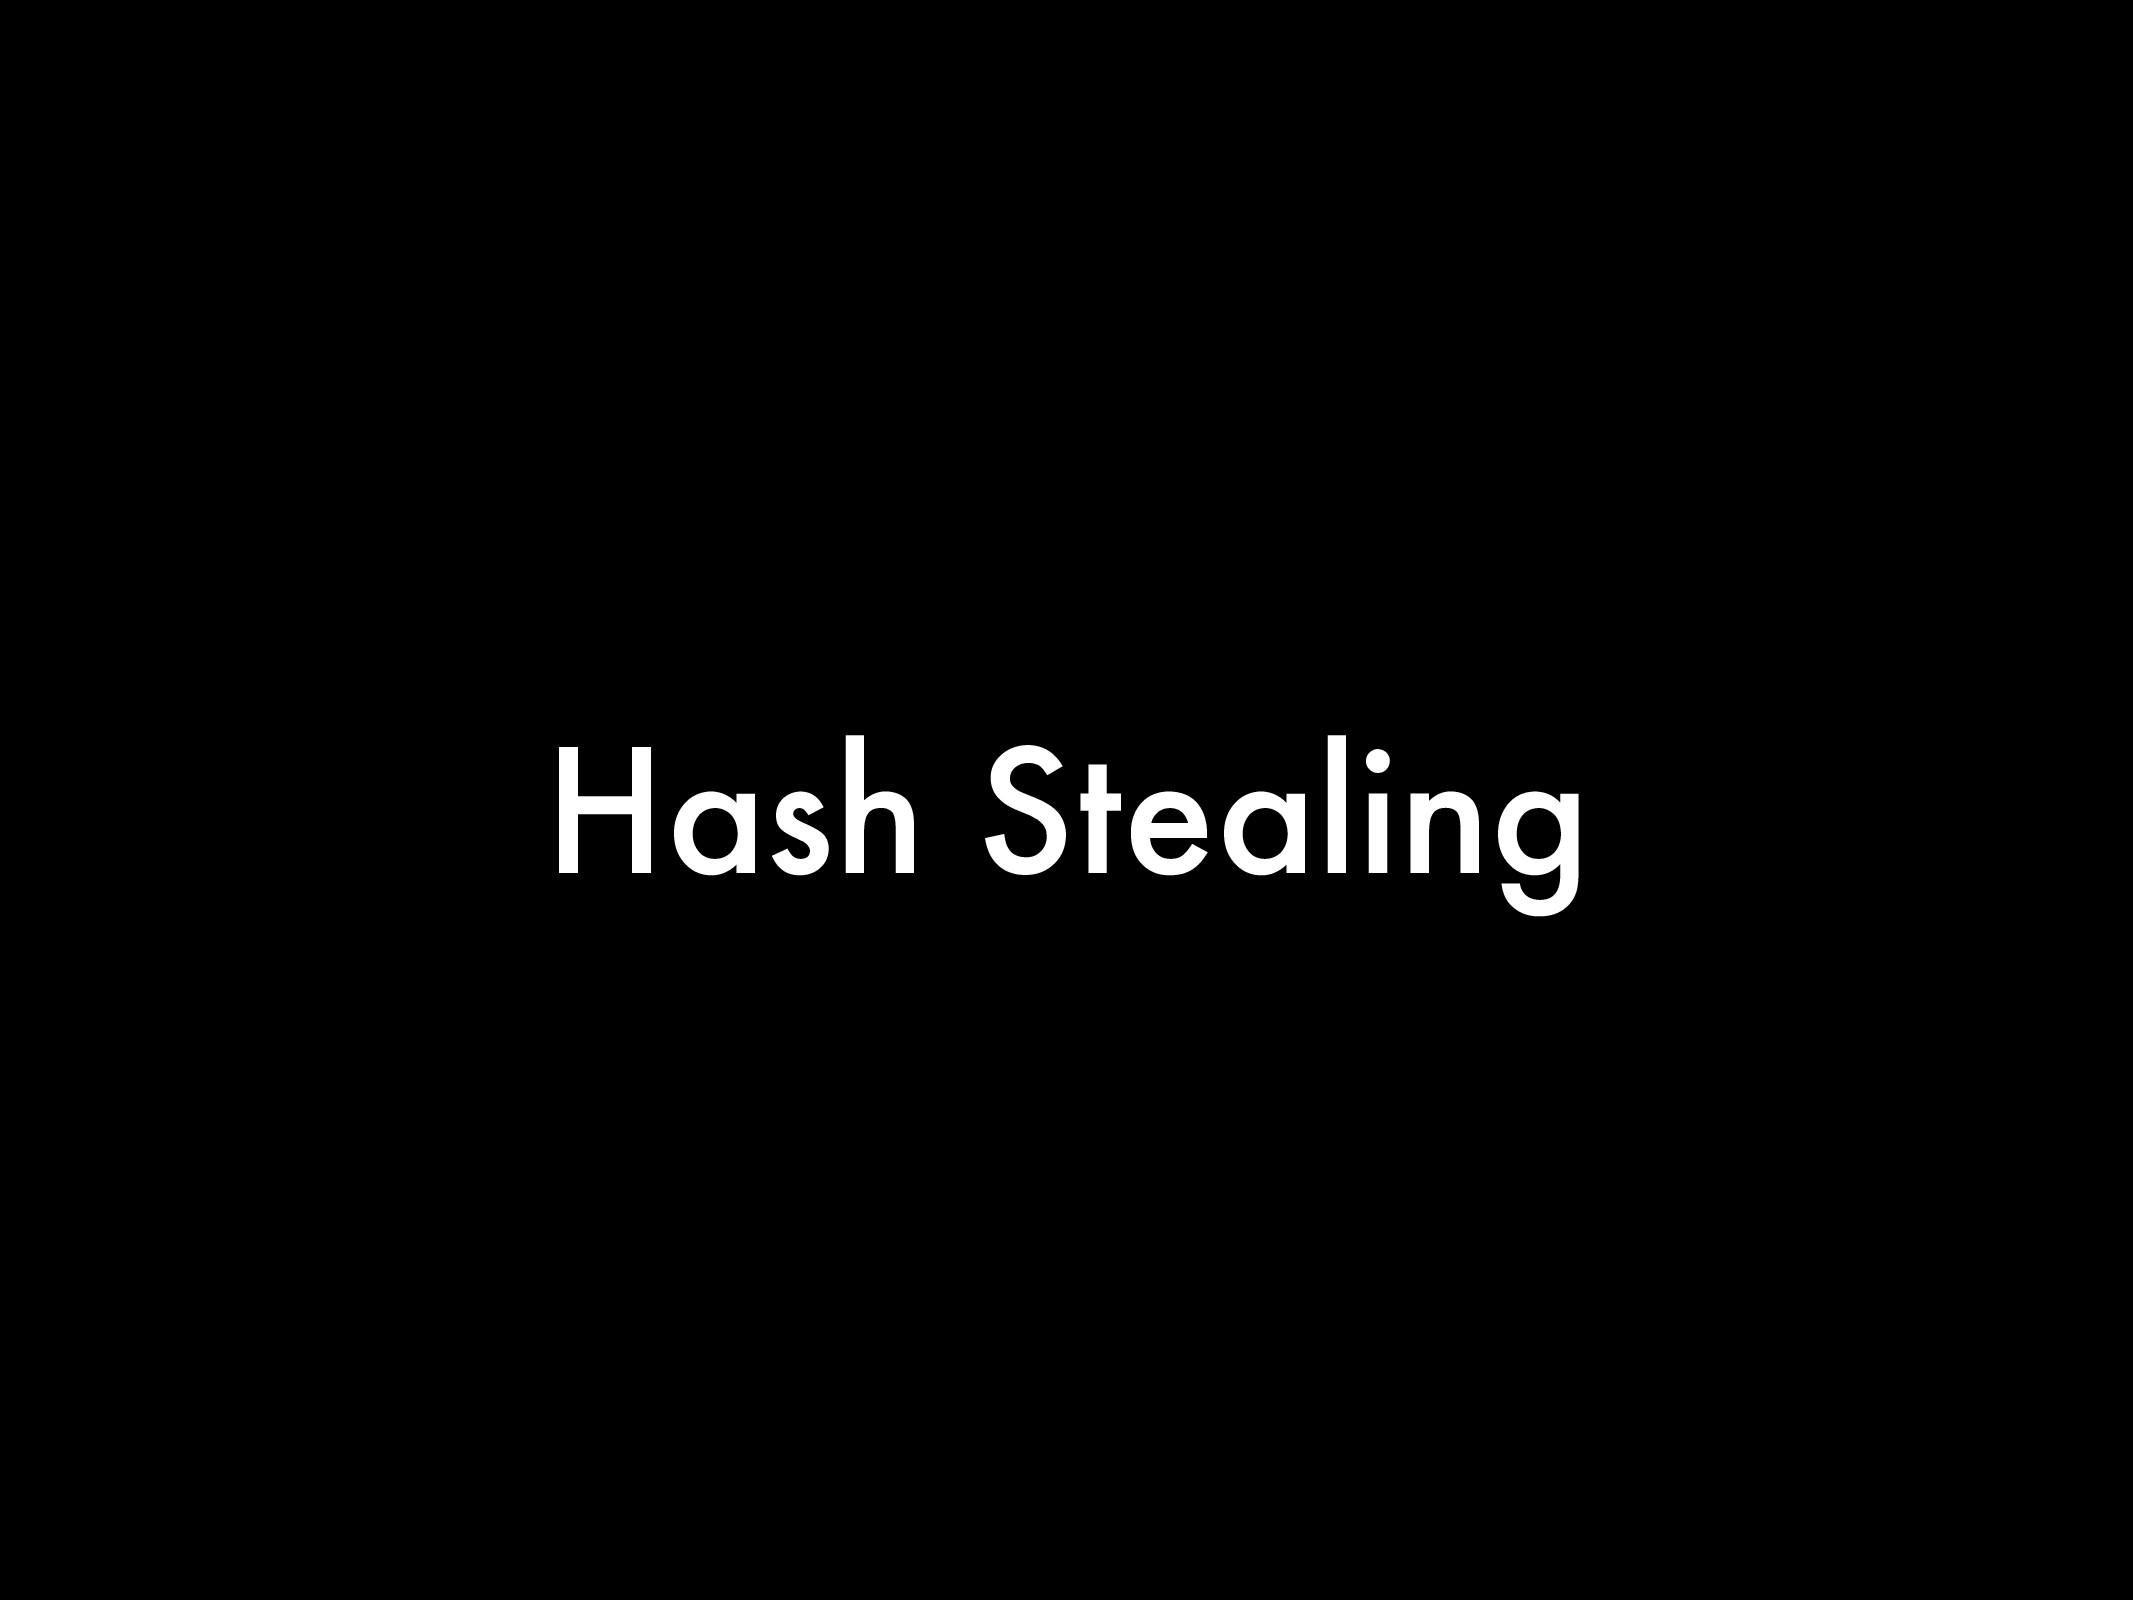 Hash Stealing